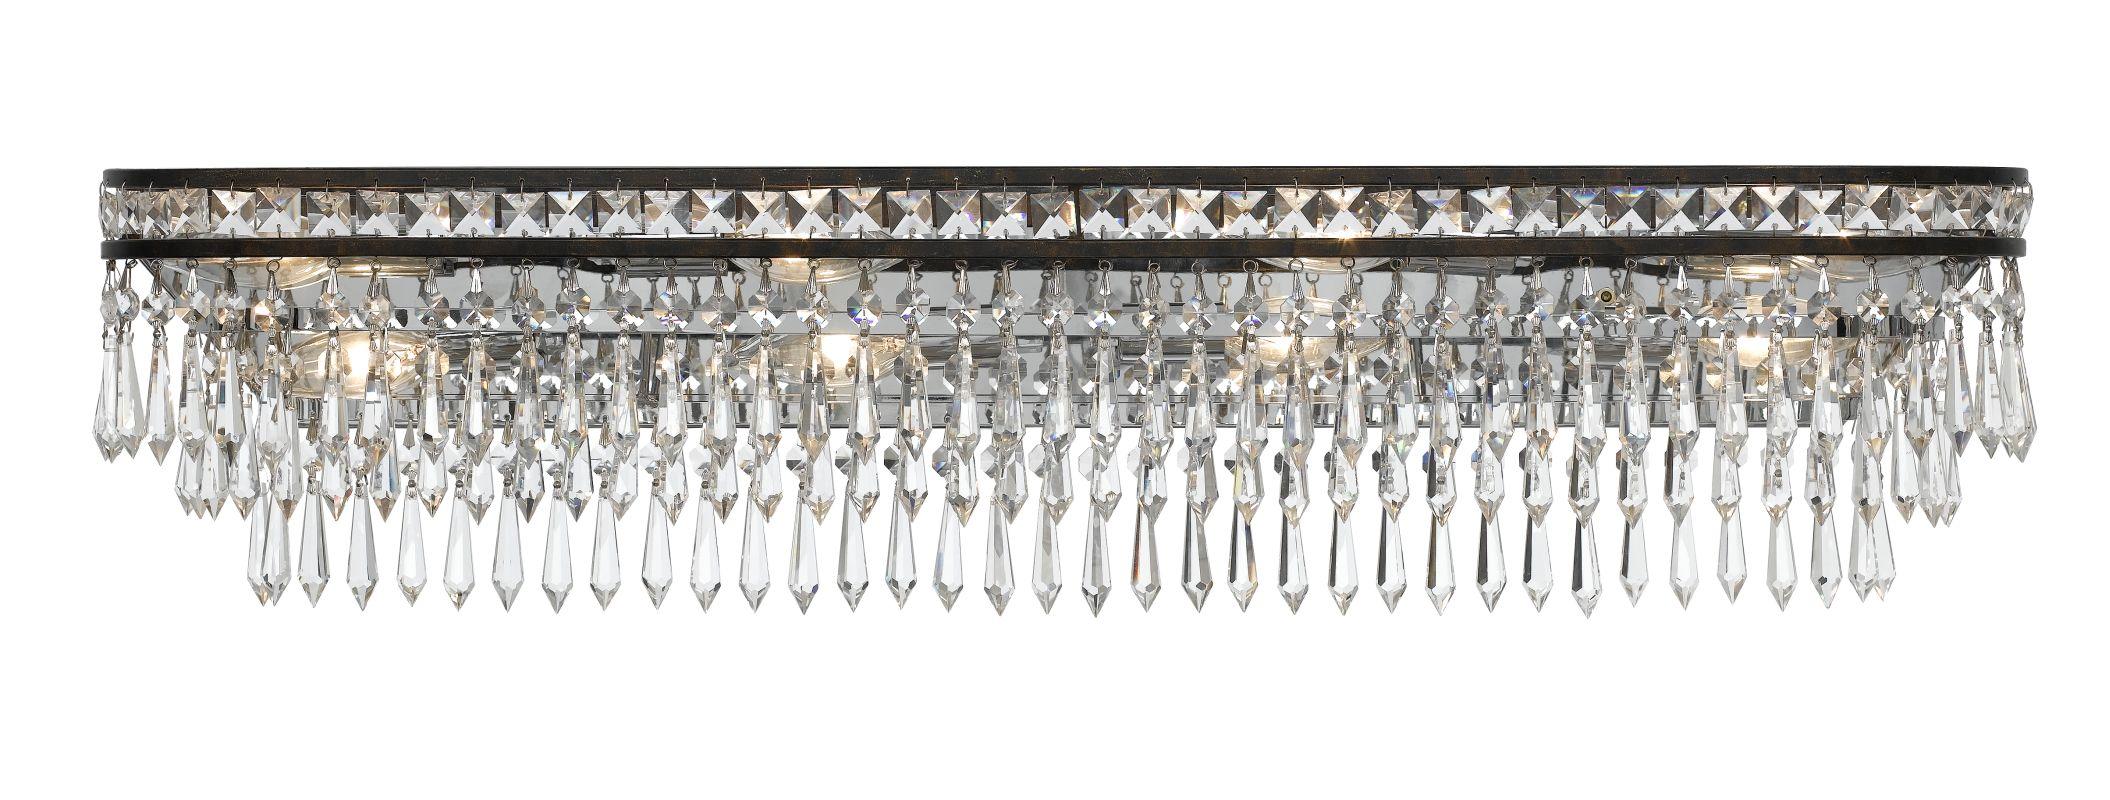 Crystorama Lighting Group 5267 Mercer 8 Light Bathroom Vanity Light Sale $650.00 ITEM#: 2362509 MODEL# :5267-EB-CL-MWP UPC#: 633779024733 :